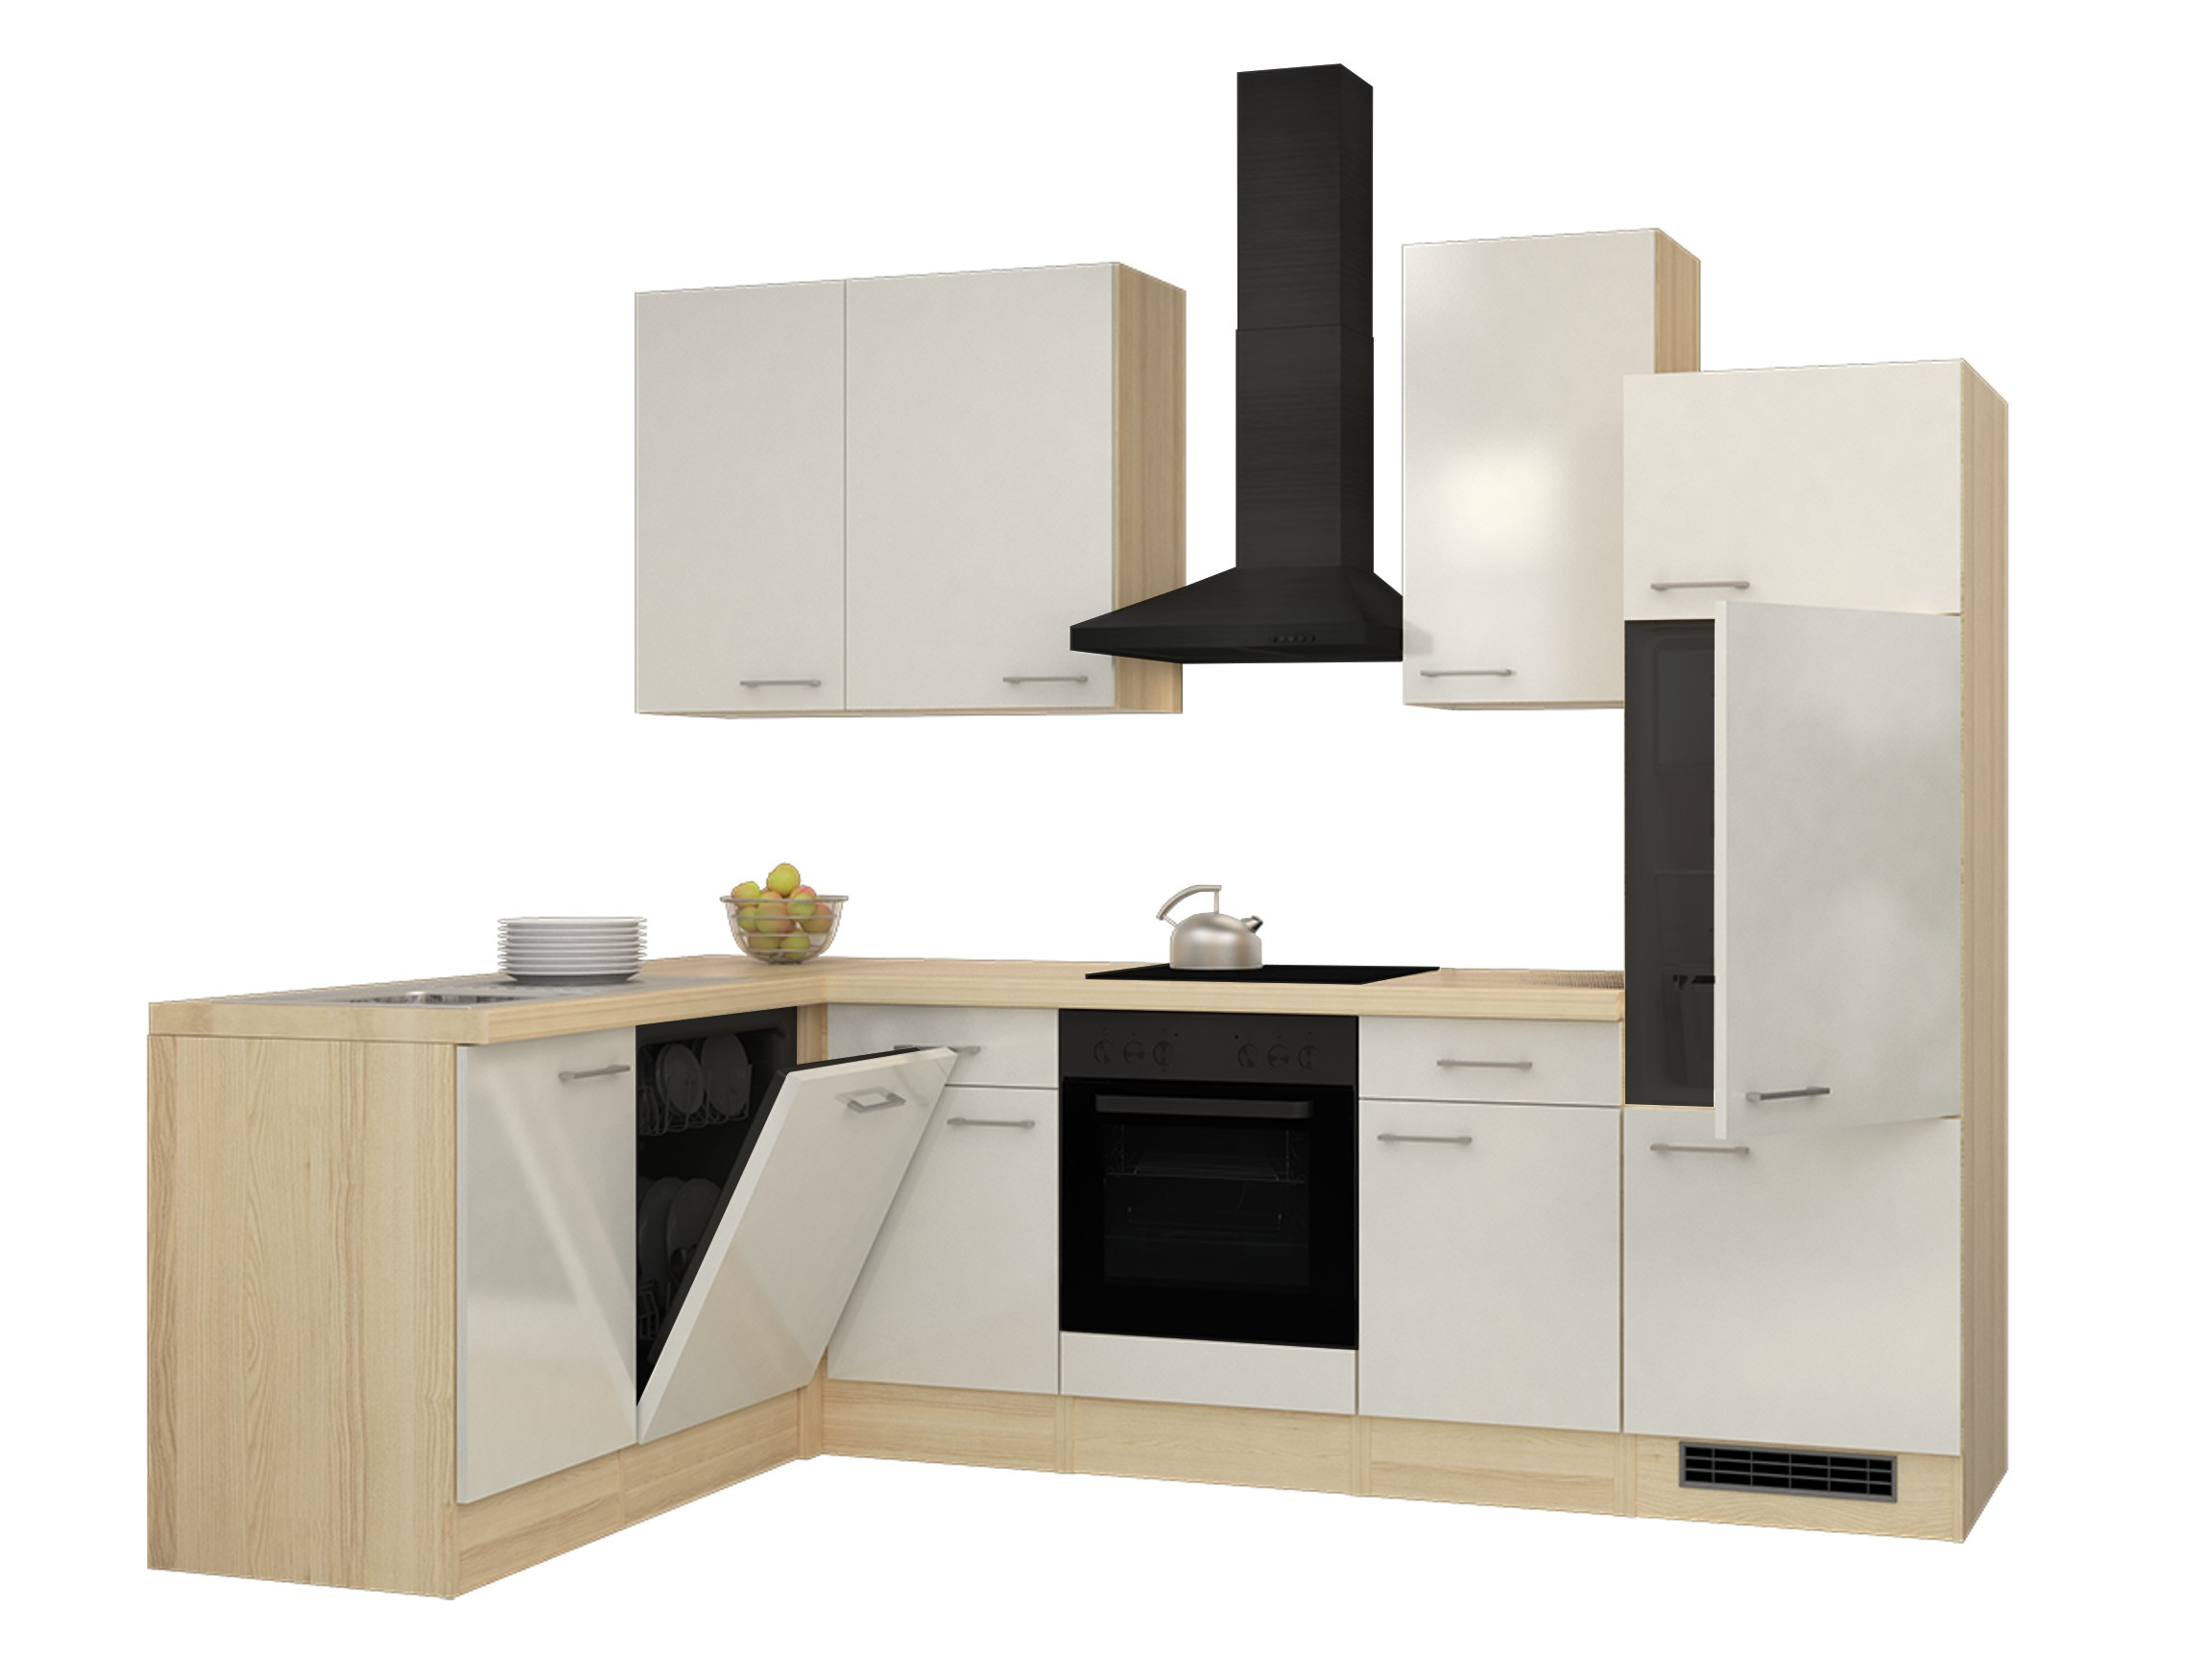 eckk che florenz l k che ohne e ger te breite 280 x 170 cm perlmutt wei k che k chenzeilen. Black Bedroom Furniture Sets. Home Design Ideas